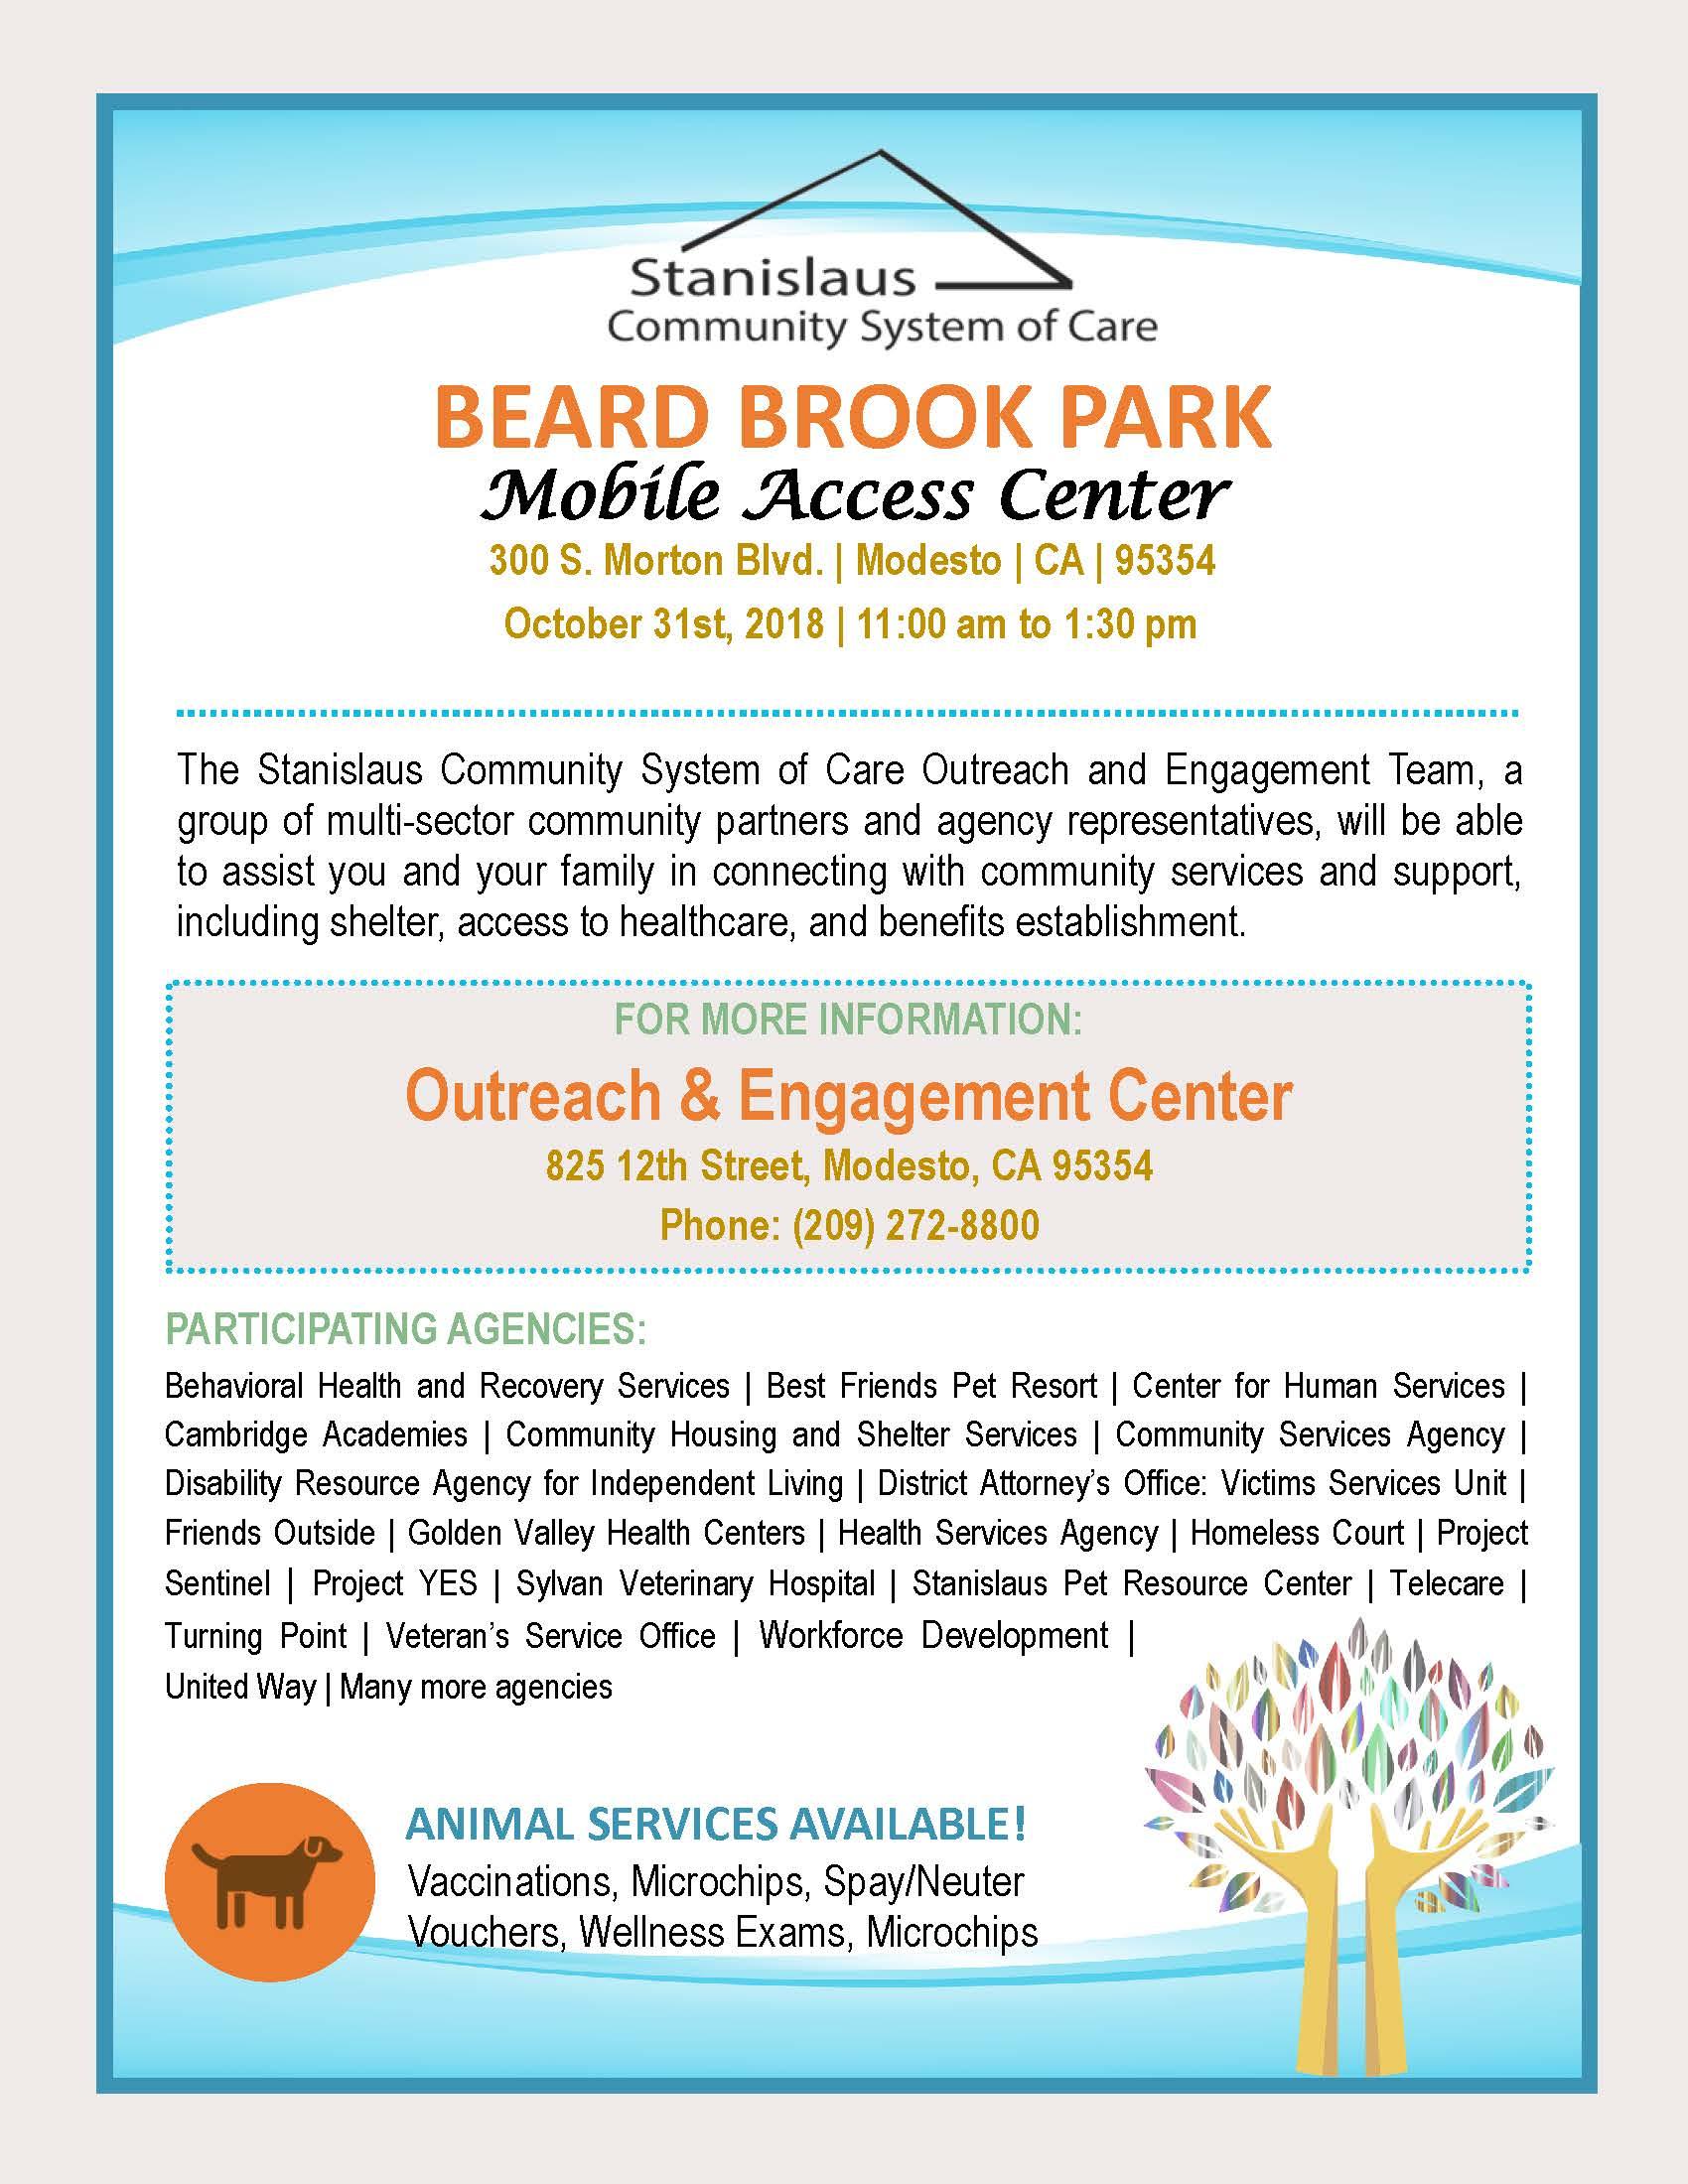 Beard Brook Park Mobile Access Center 1031